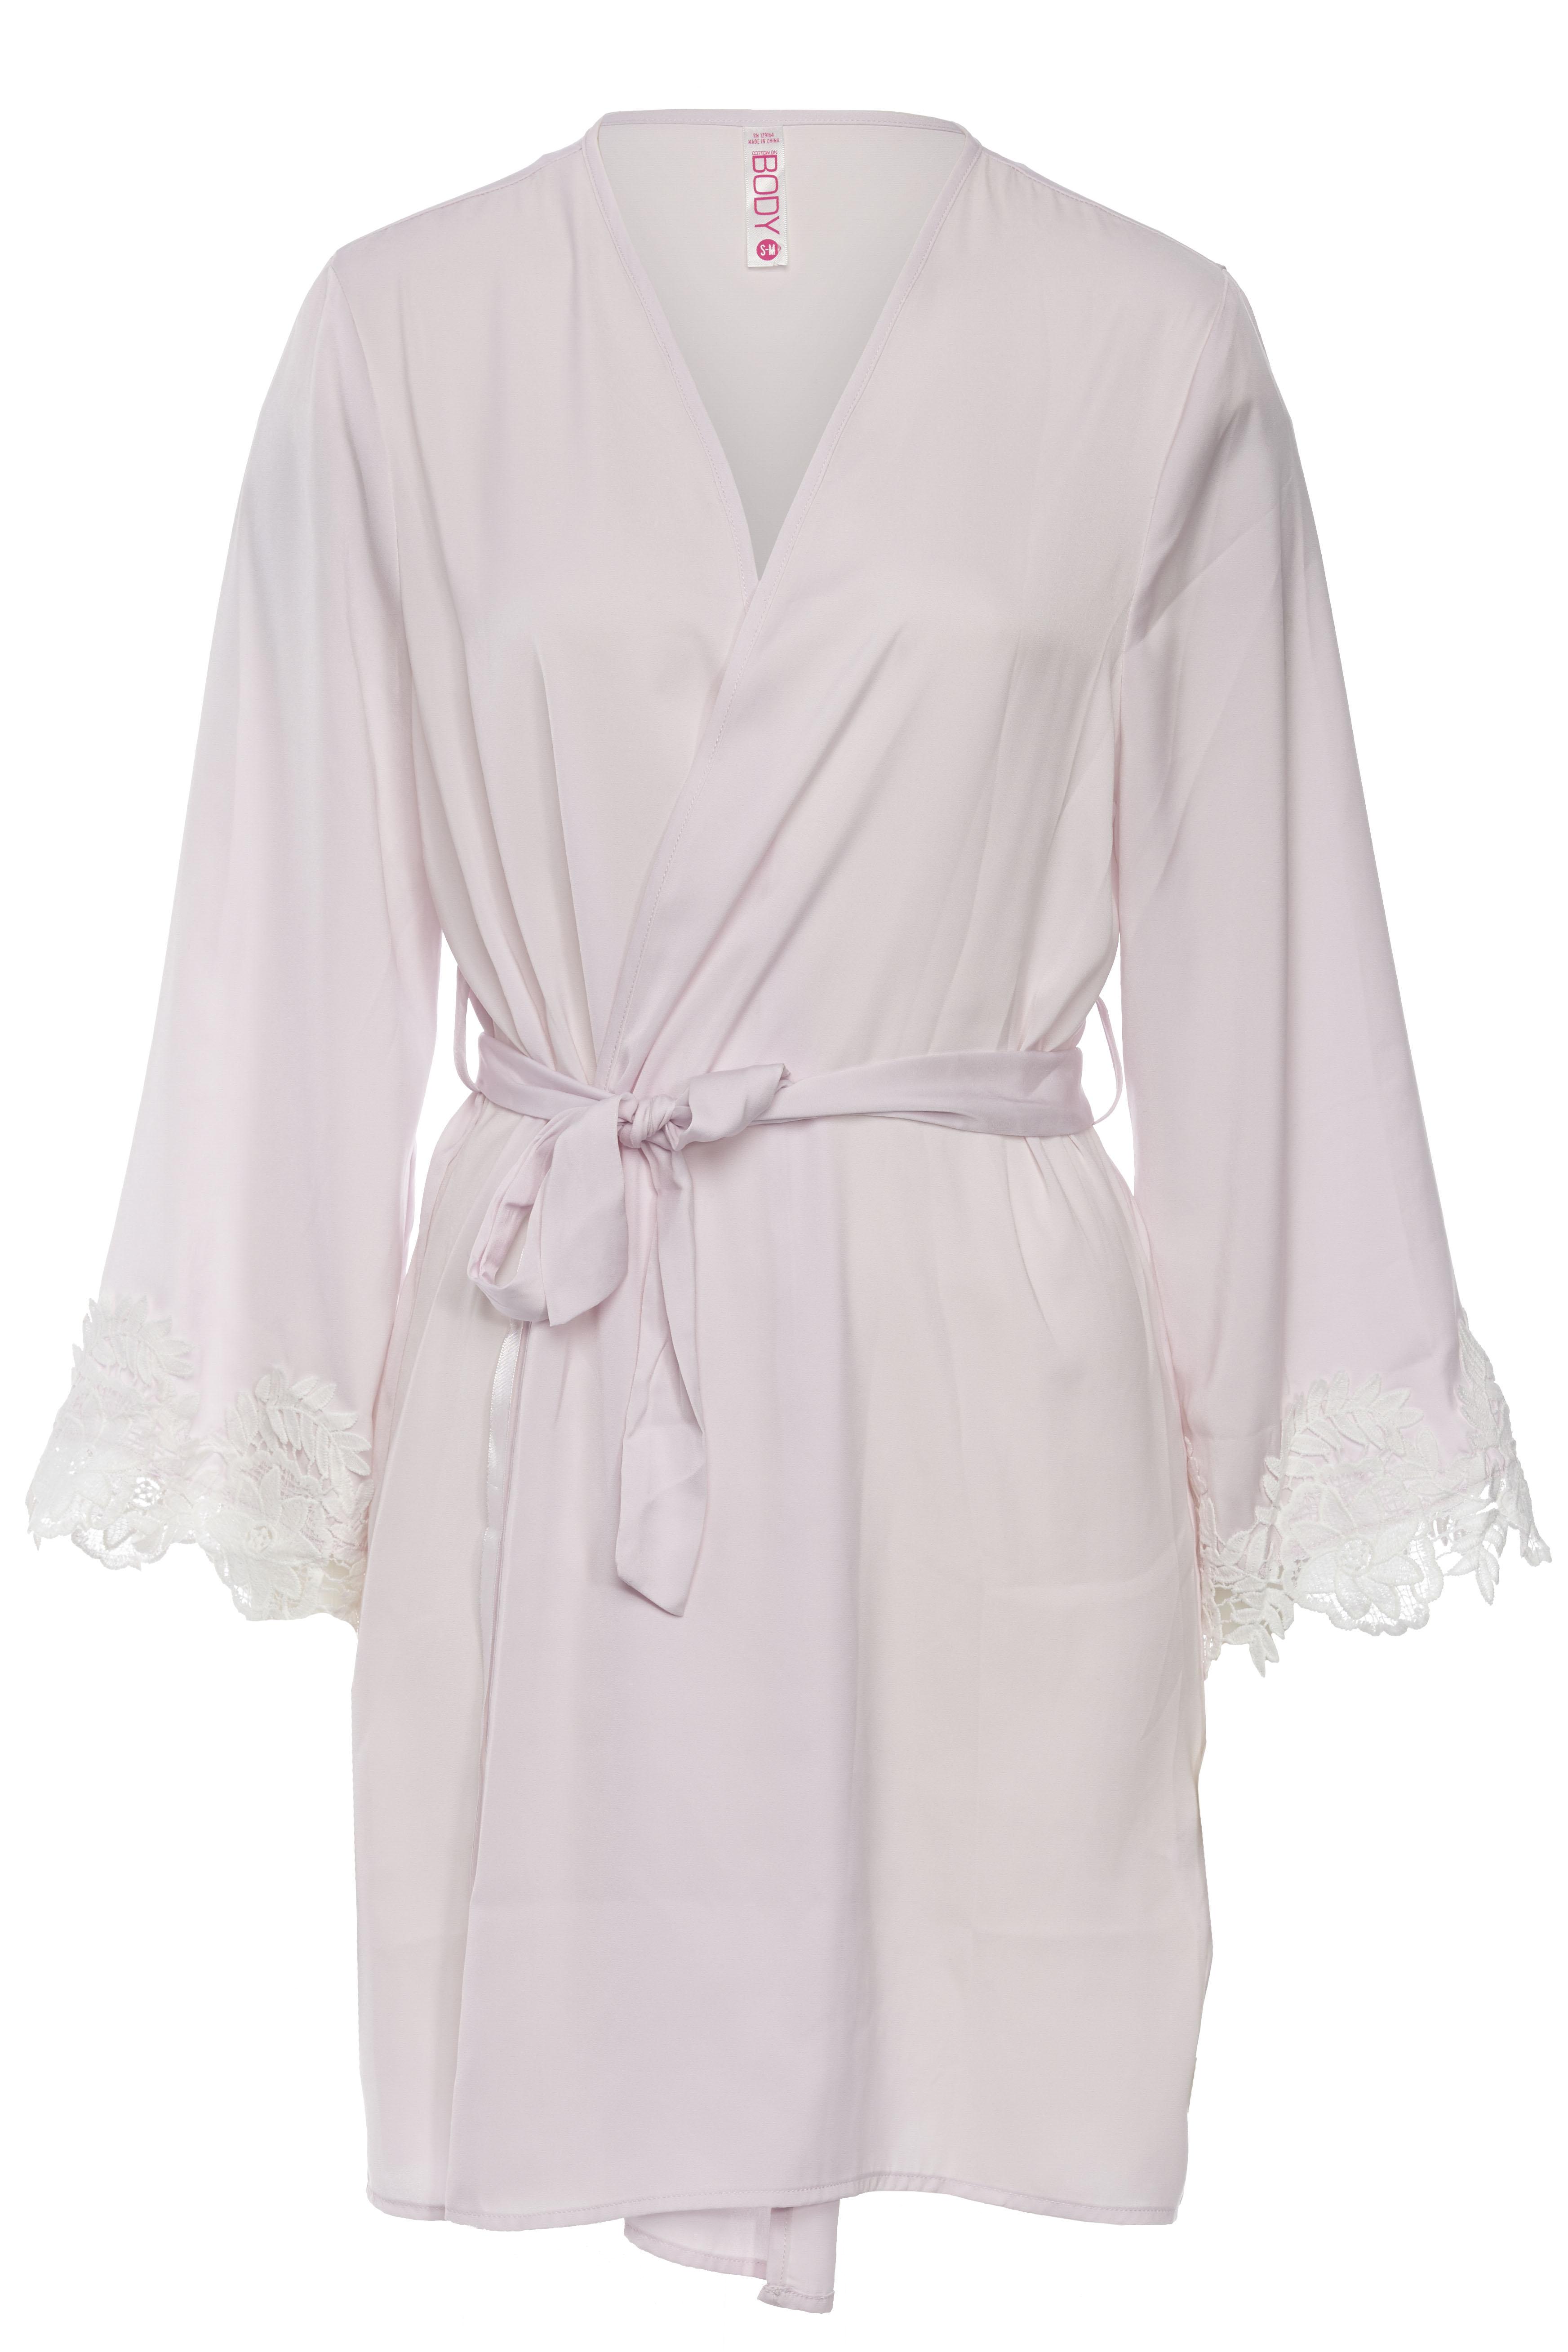 cotton-on-body_talia-gown_nz39-95-sept-dec